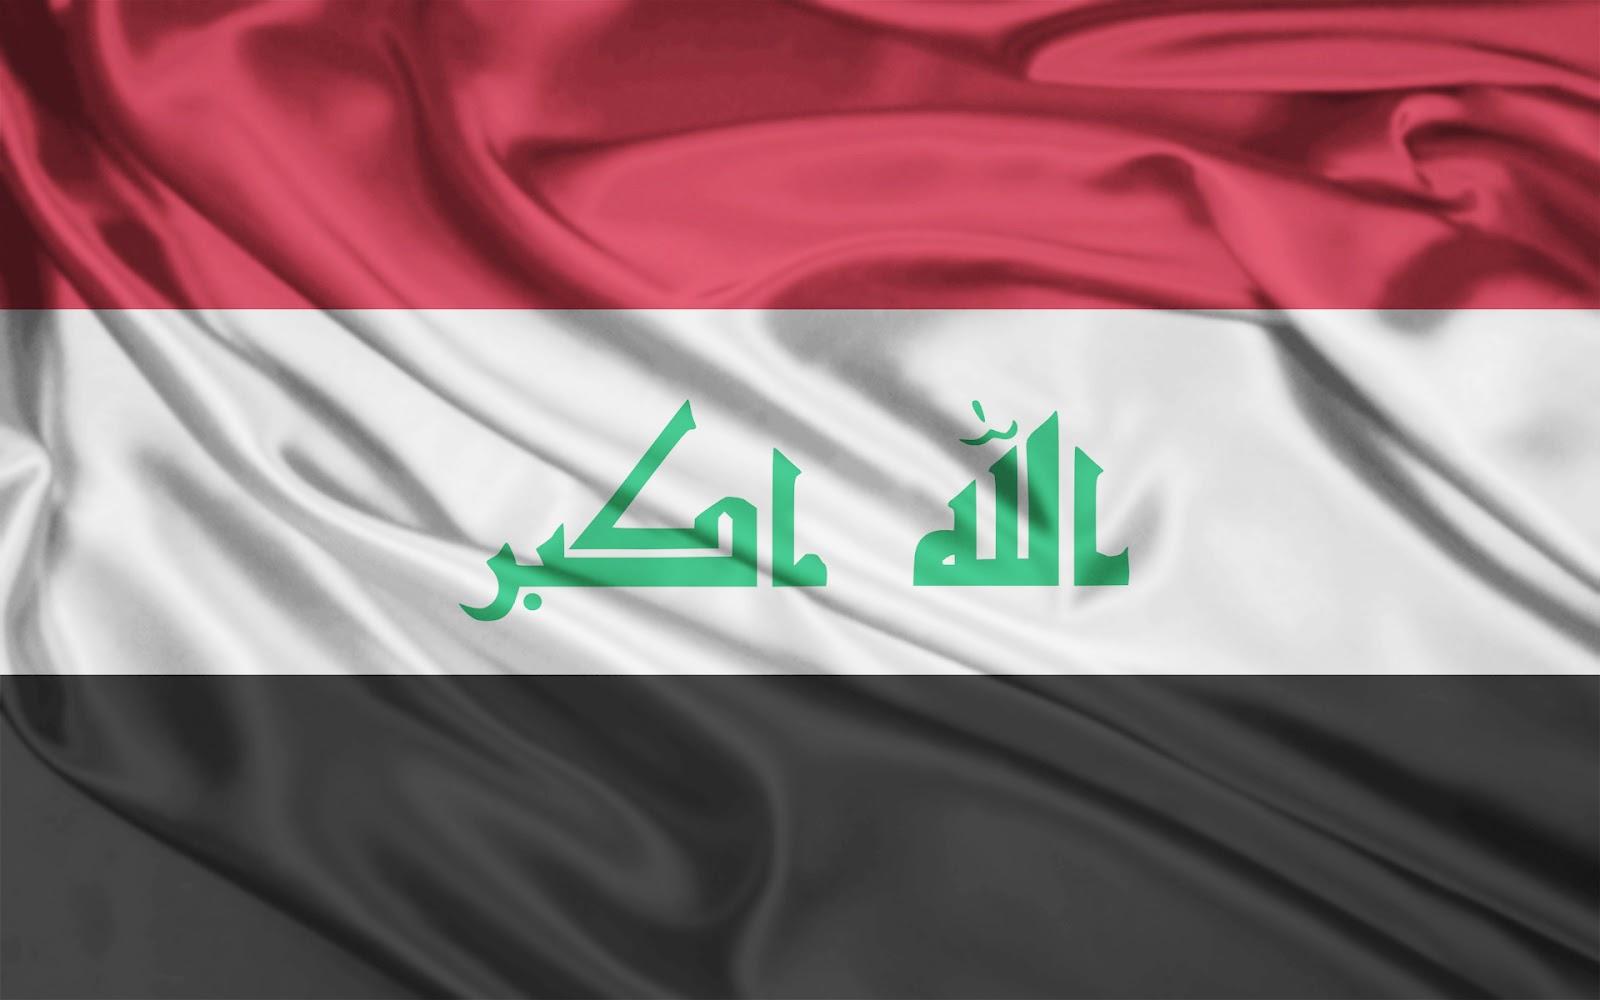 http://1.bp.blogspot.com/-CE2qH-5BPzc/UDv-DgfhI2I/AAAAAAAAAb8/tUI2LHgeStU/s1600/iraq-flag-wallpapers-1920x1200.jpg